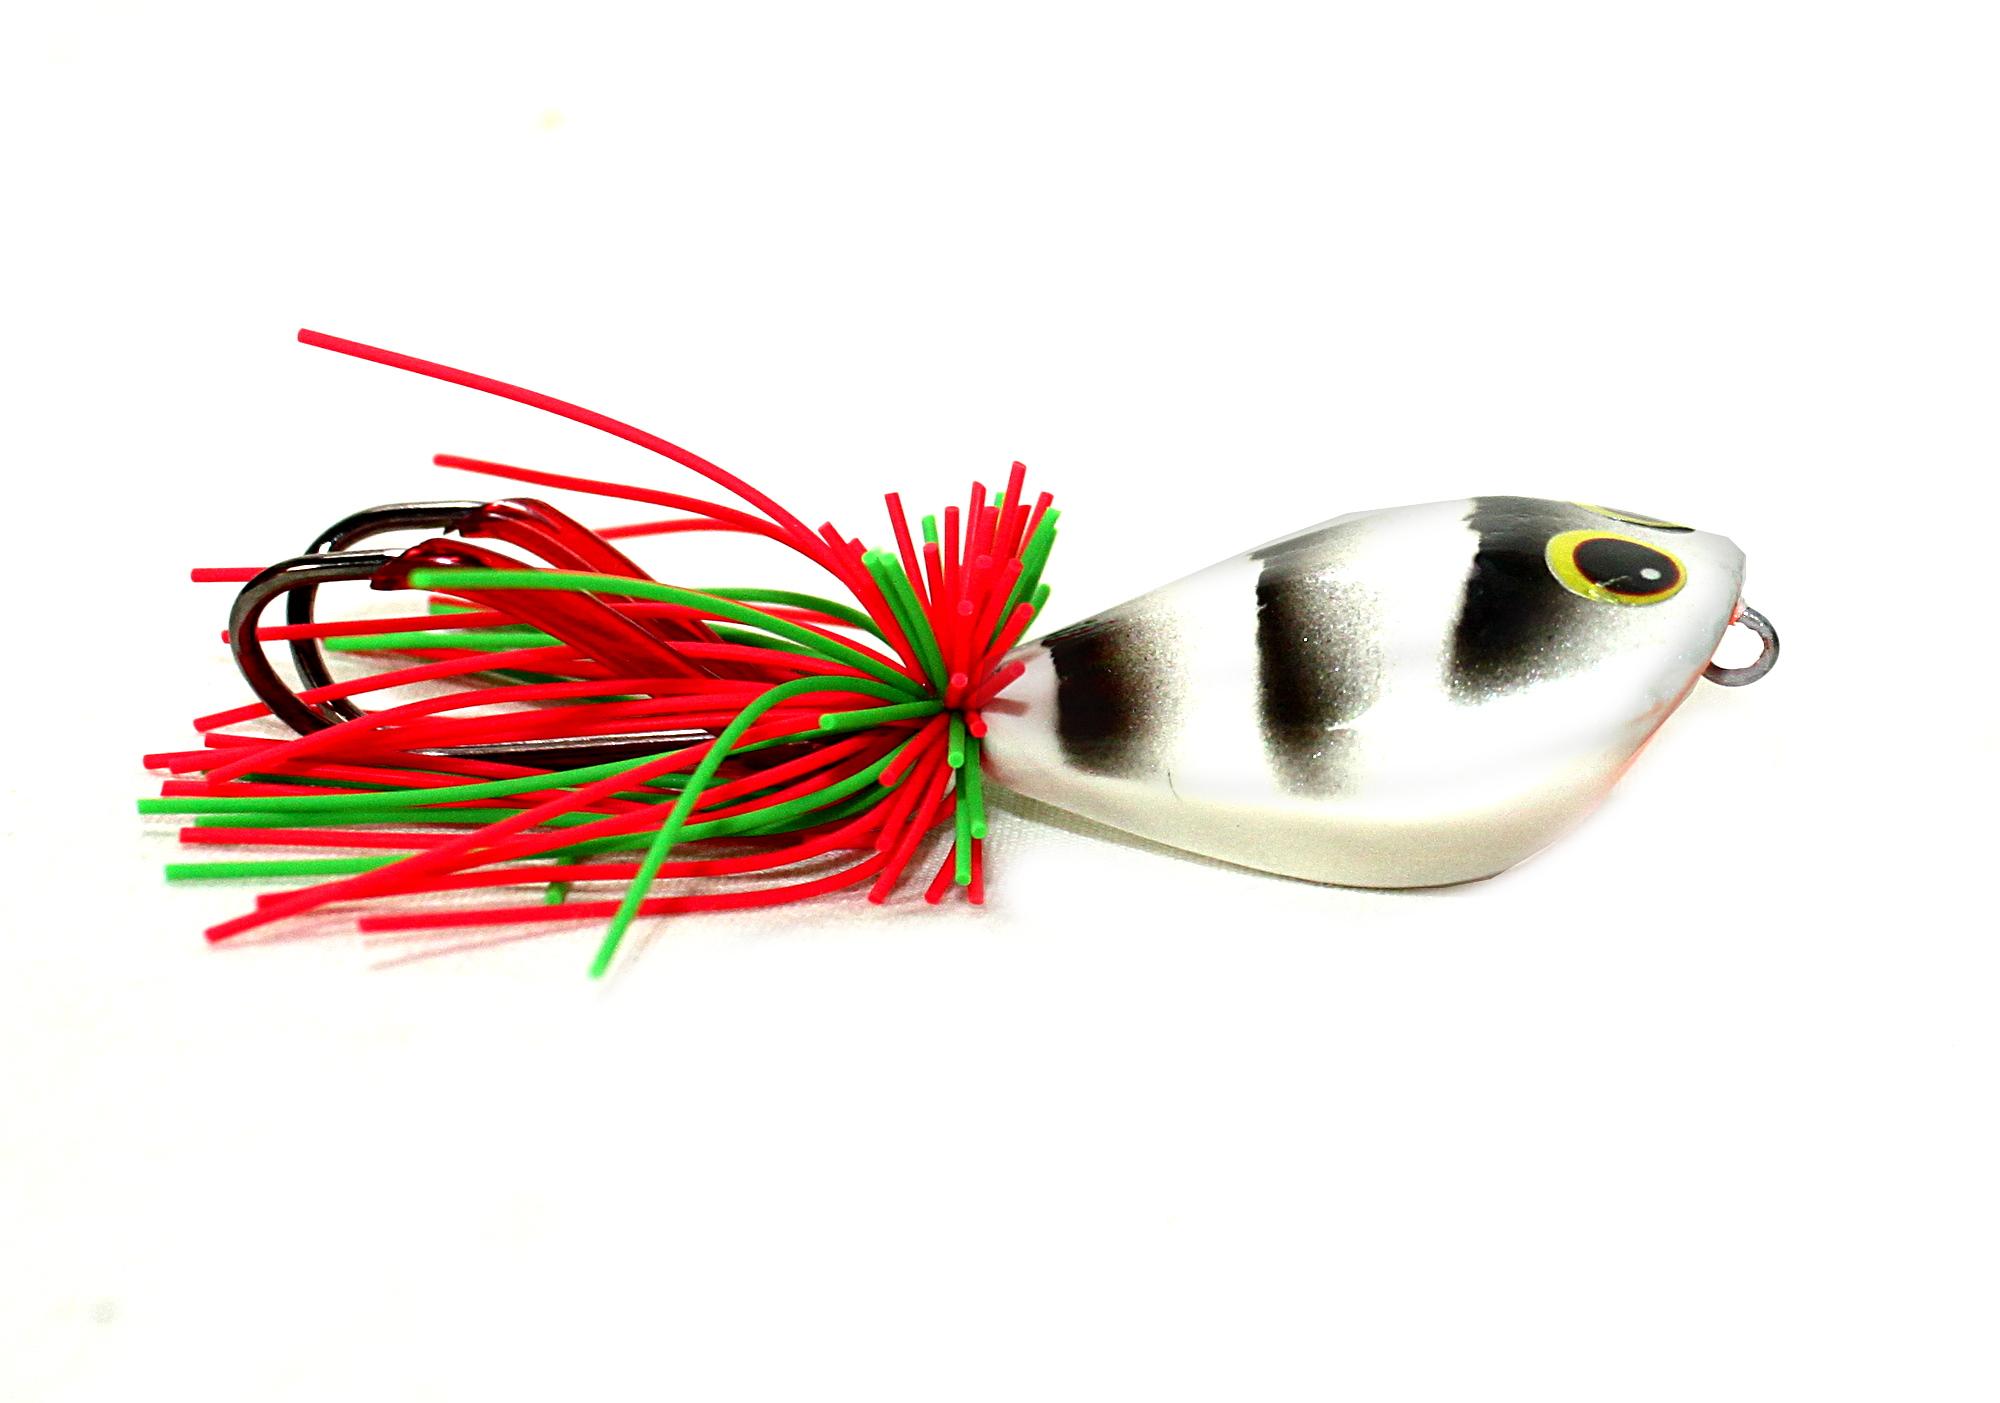 1x 8cm 12g fishing lures hard baits artificial popper crankbait wobblers baiRSPF